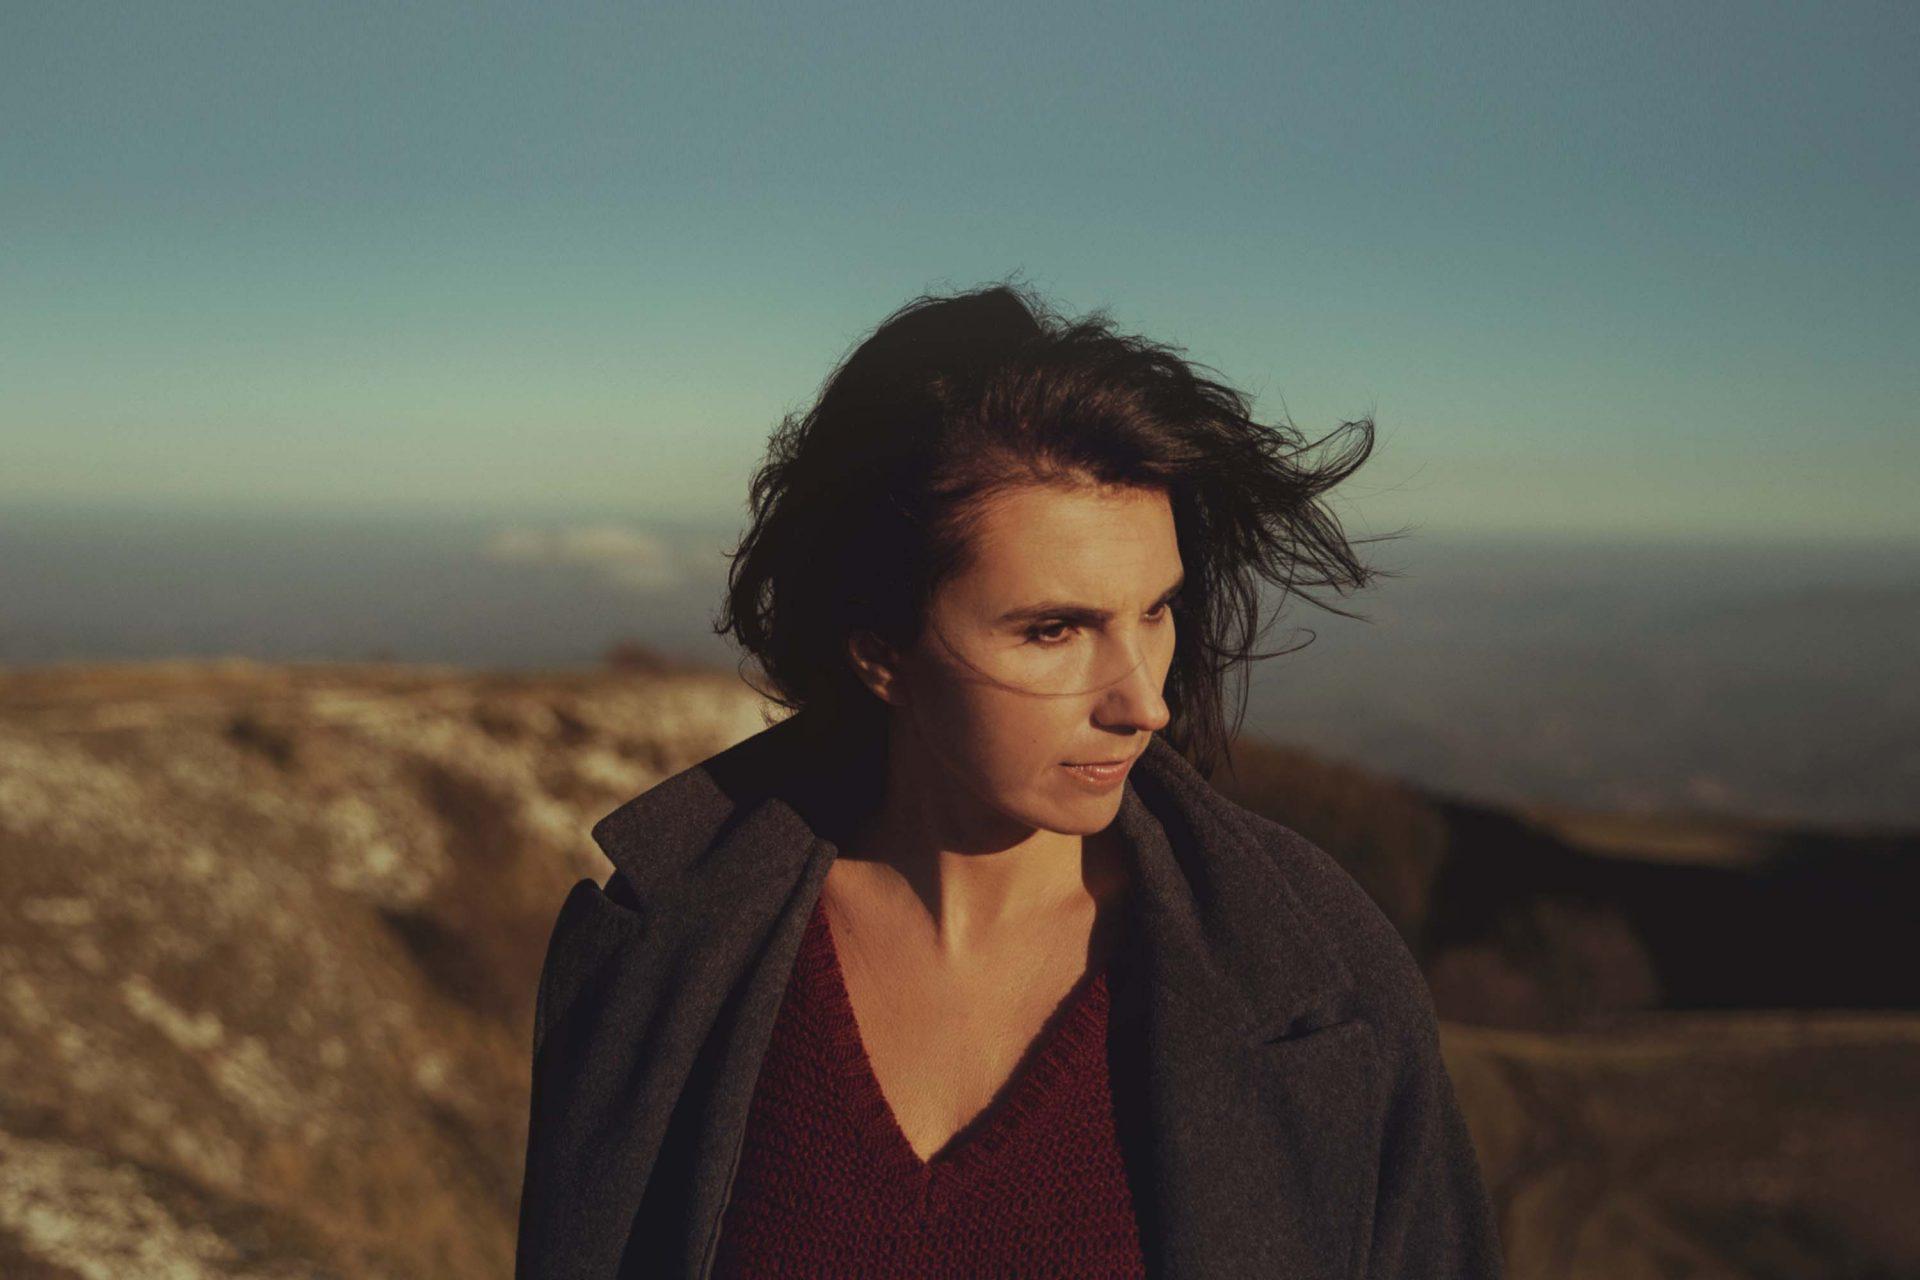 Olivia Belli releases new single and music video Island II